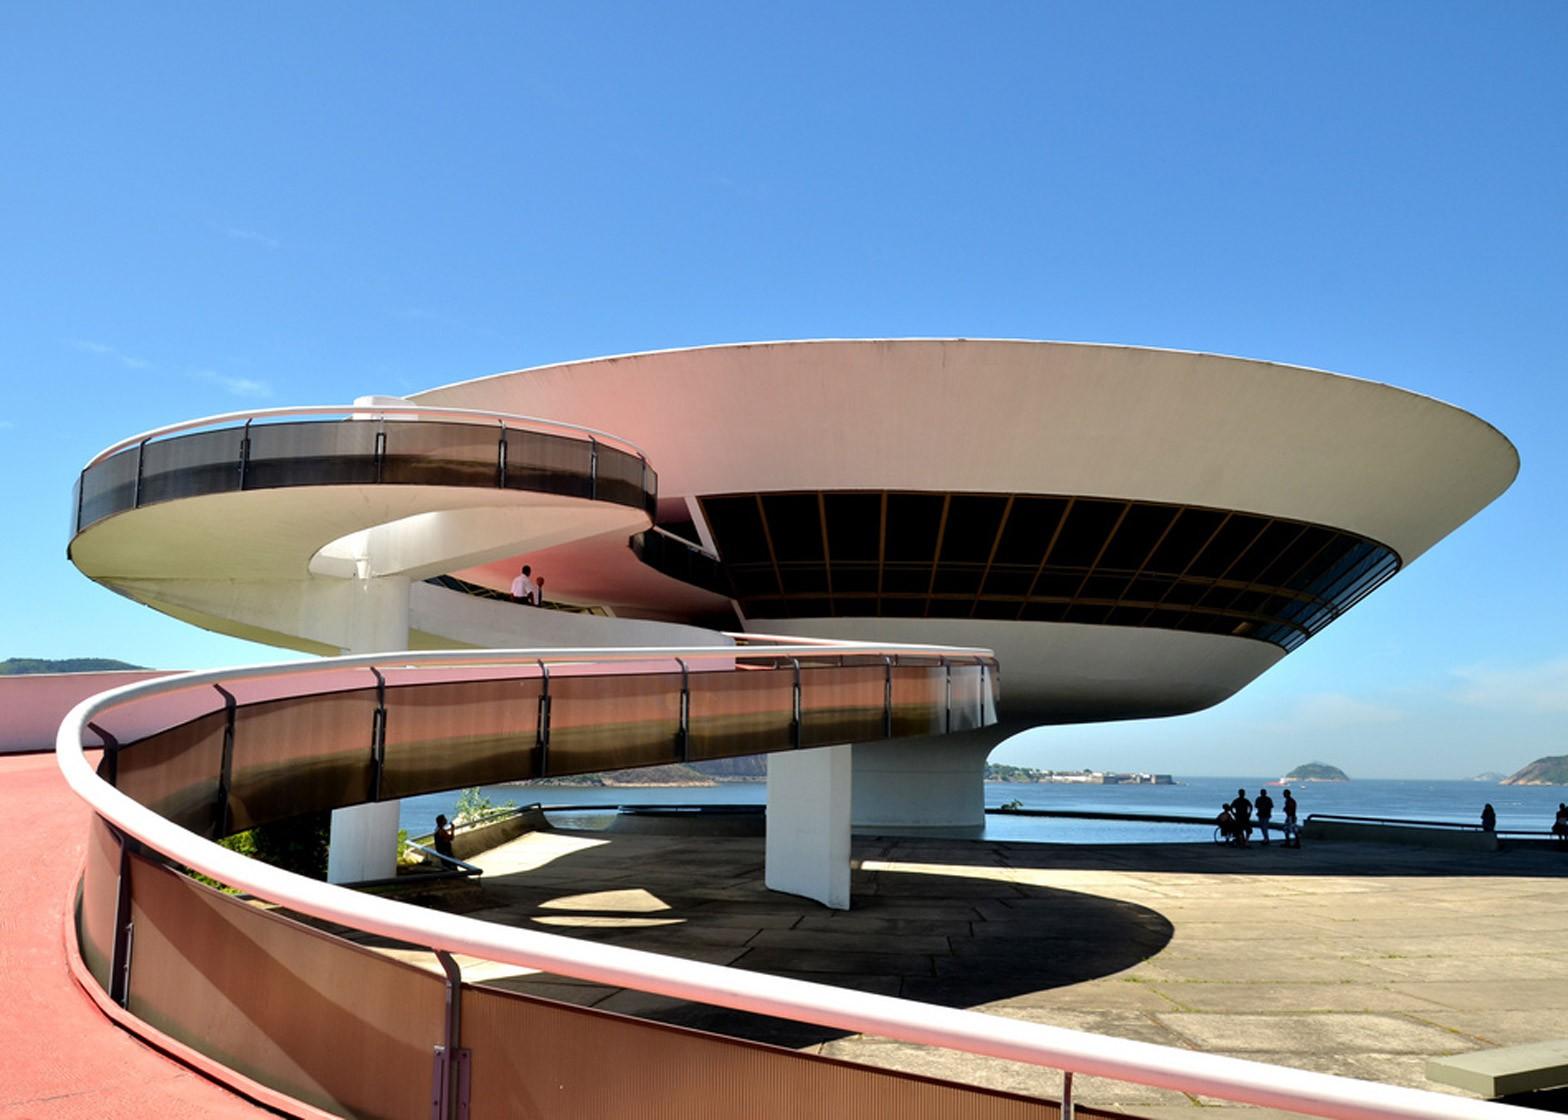 Museu de Arte Contemporânea de Niterói by Oscar Neimeyer, 1996